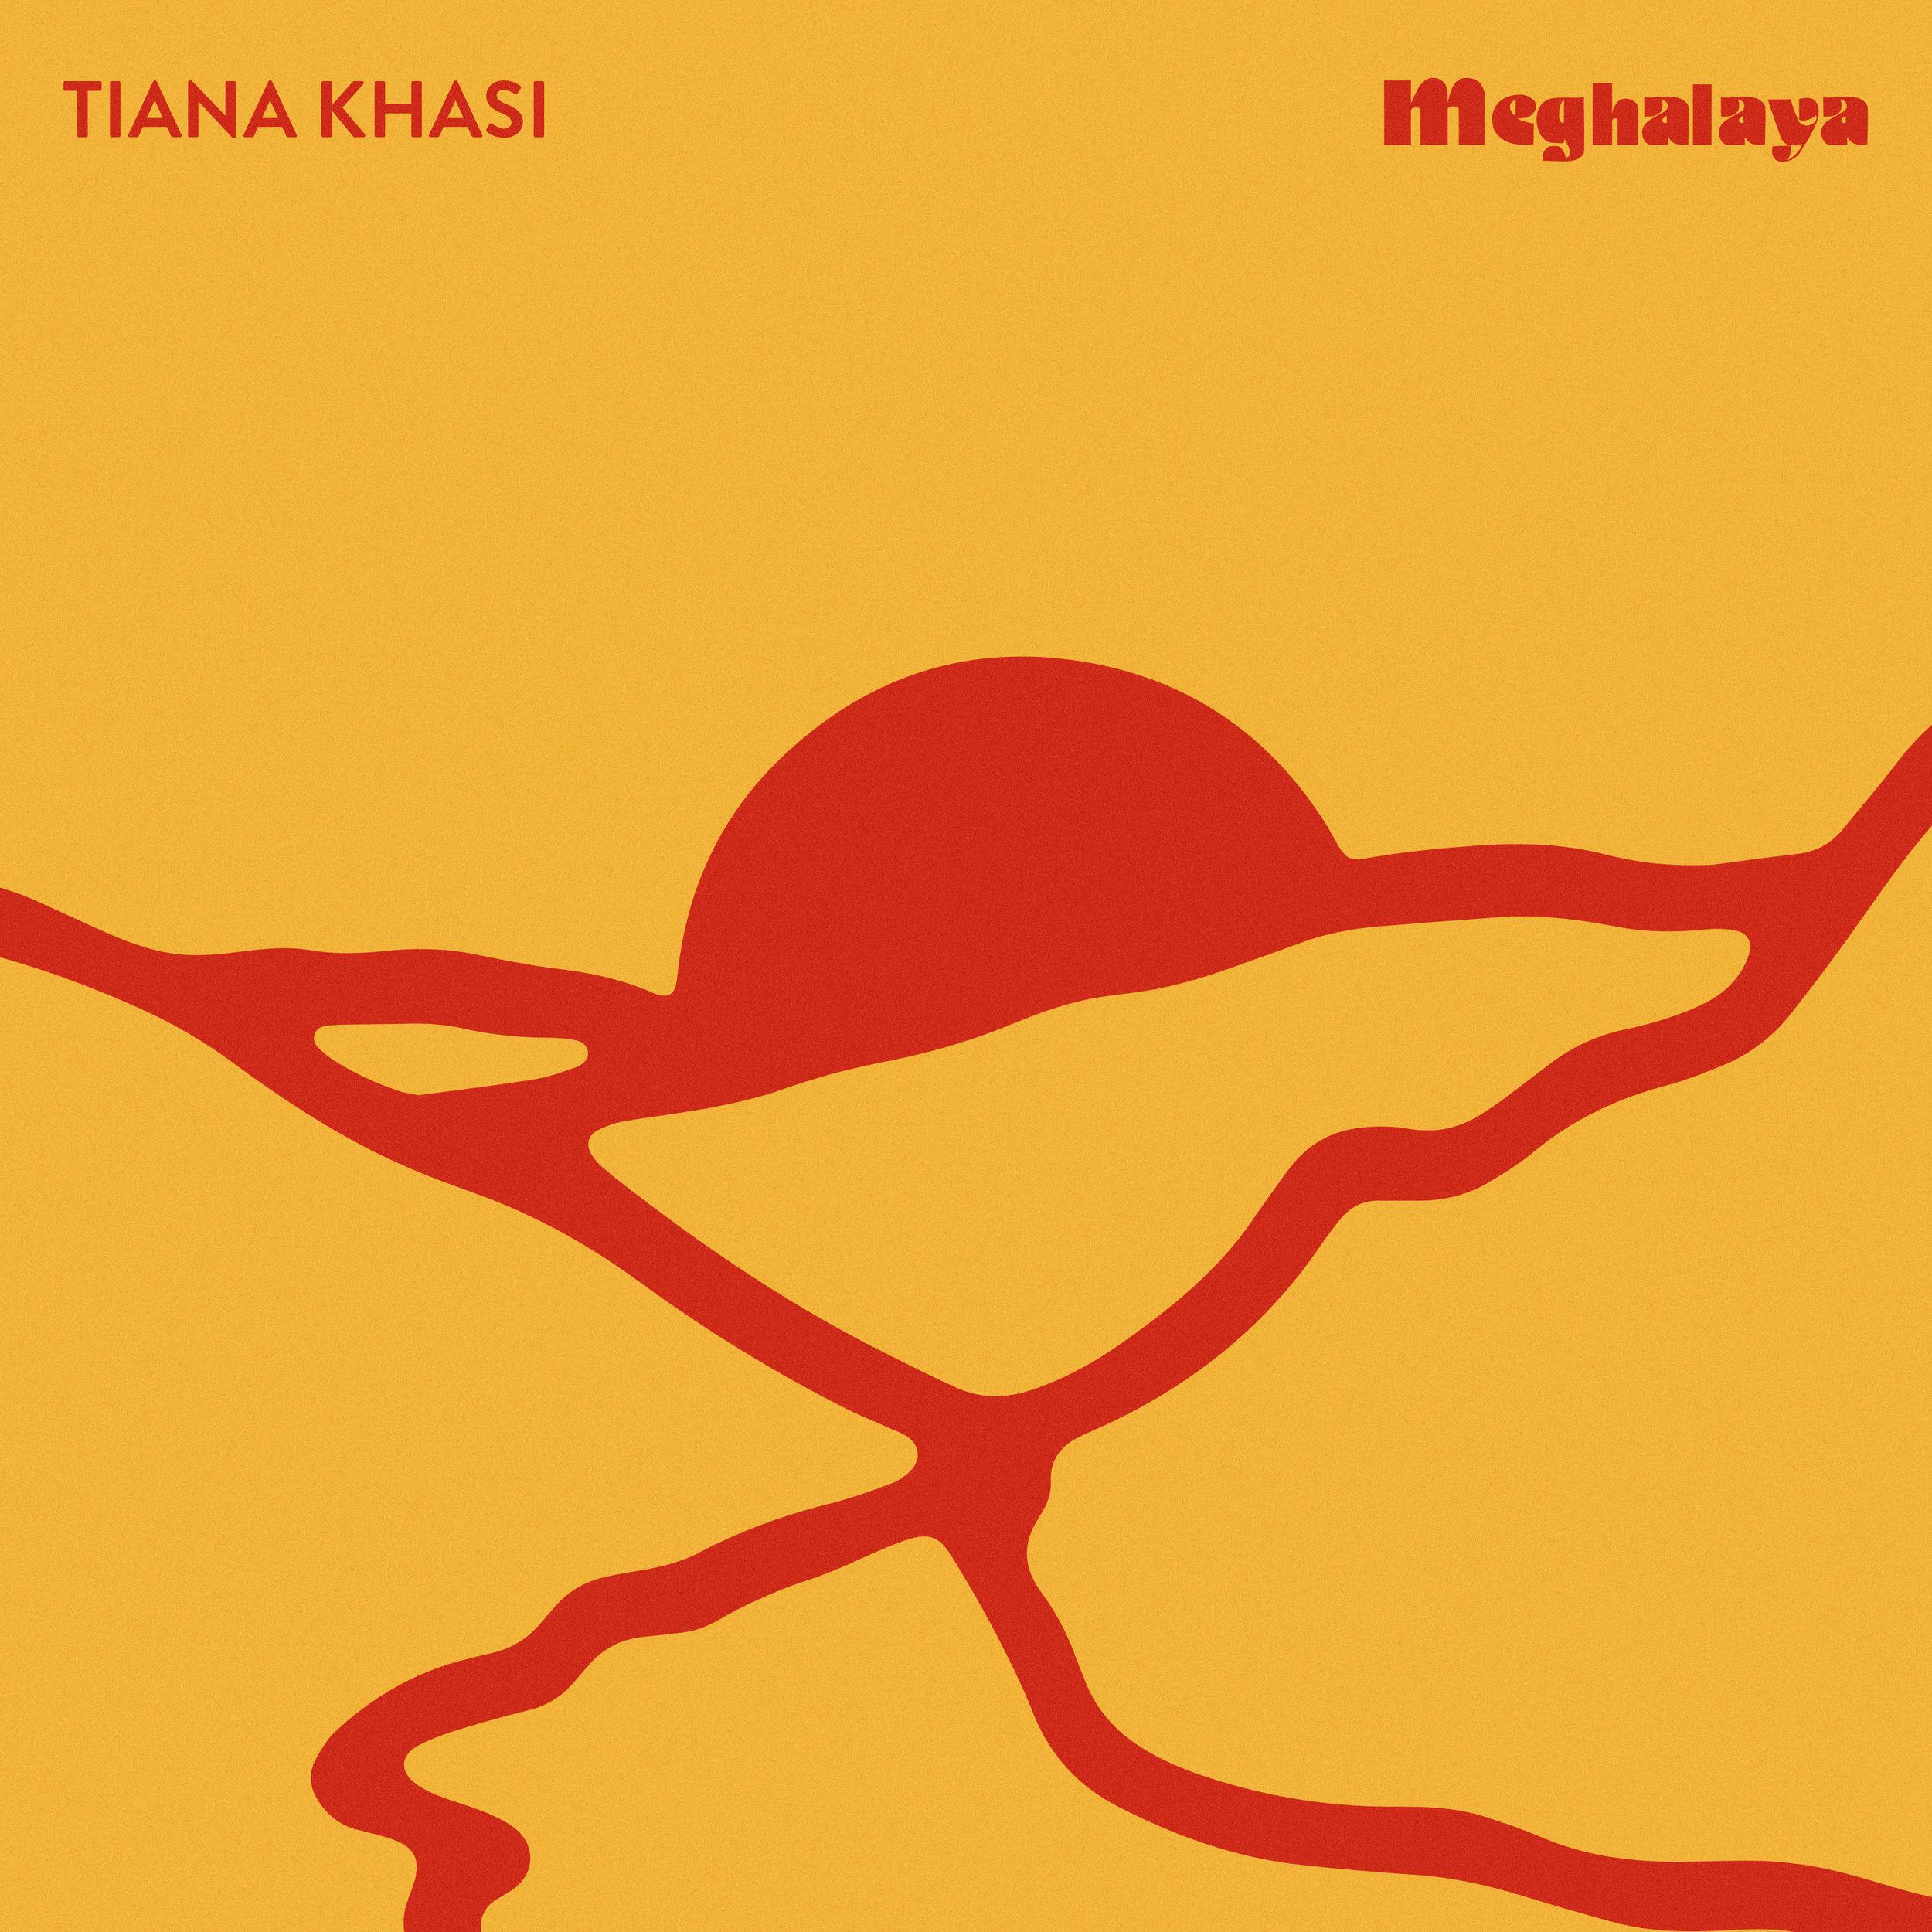 Meghalaya EP Tiana Khasi